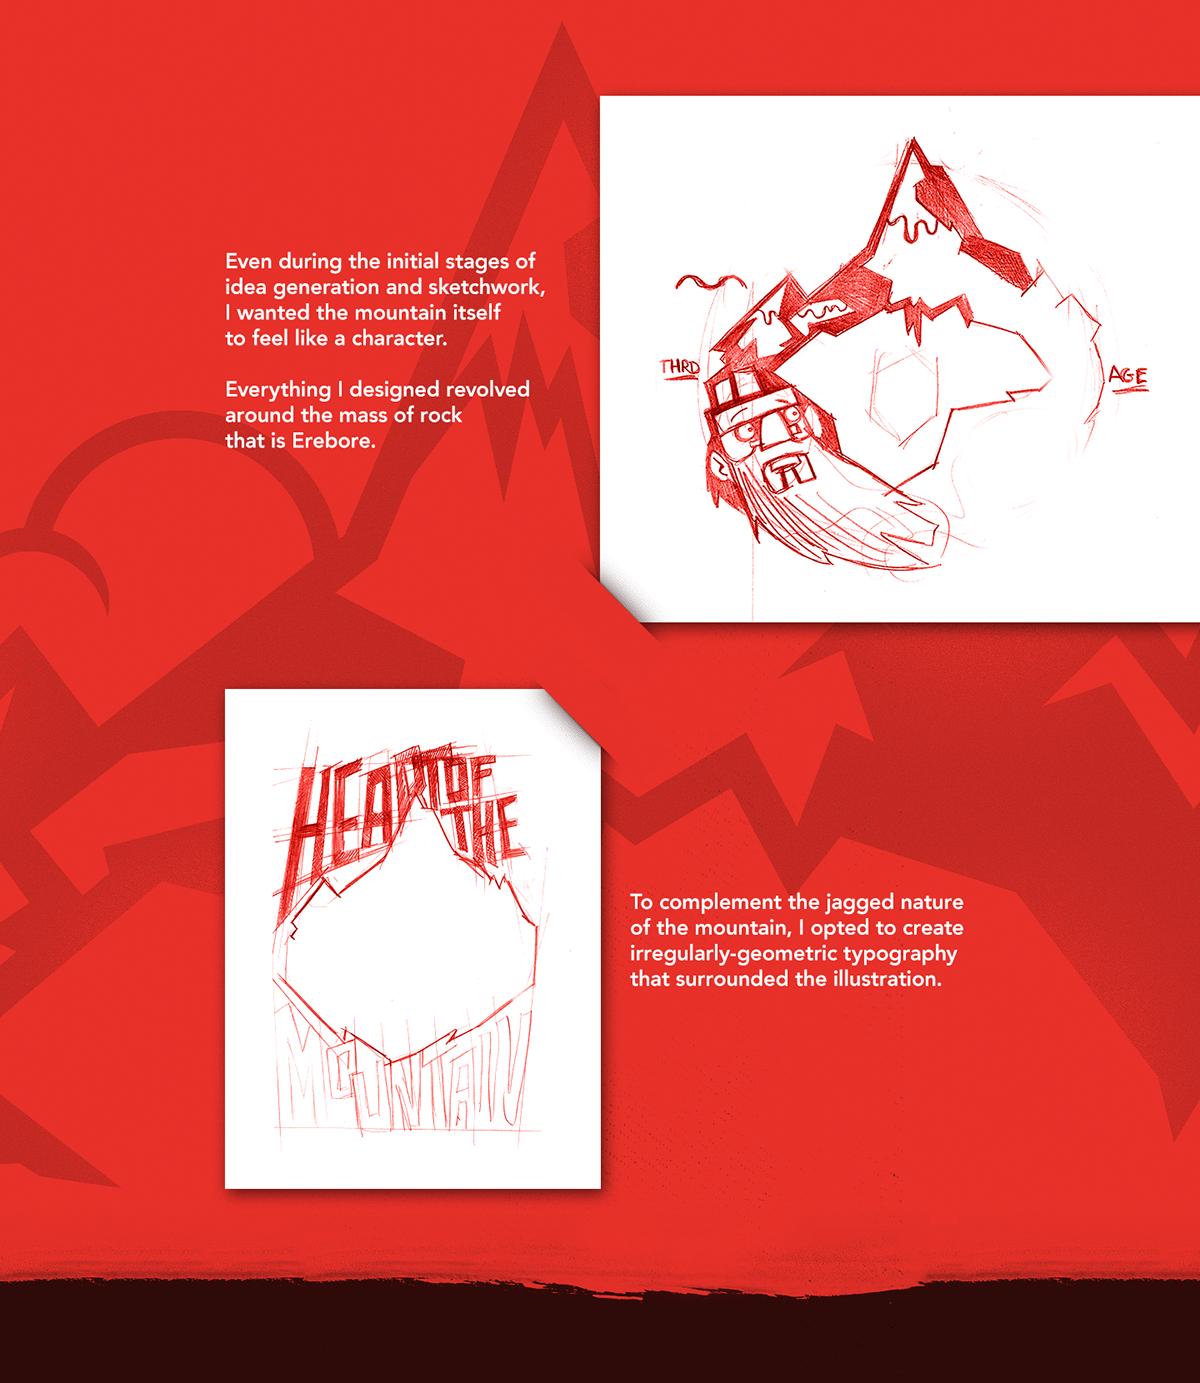 typography hearts meli schreiber - photo #43